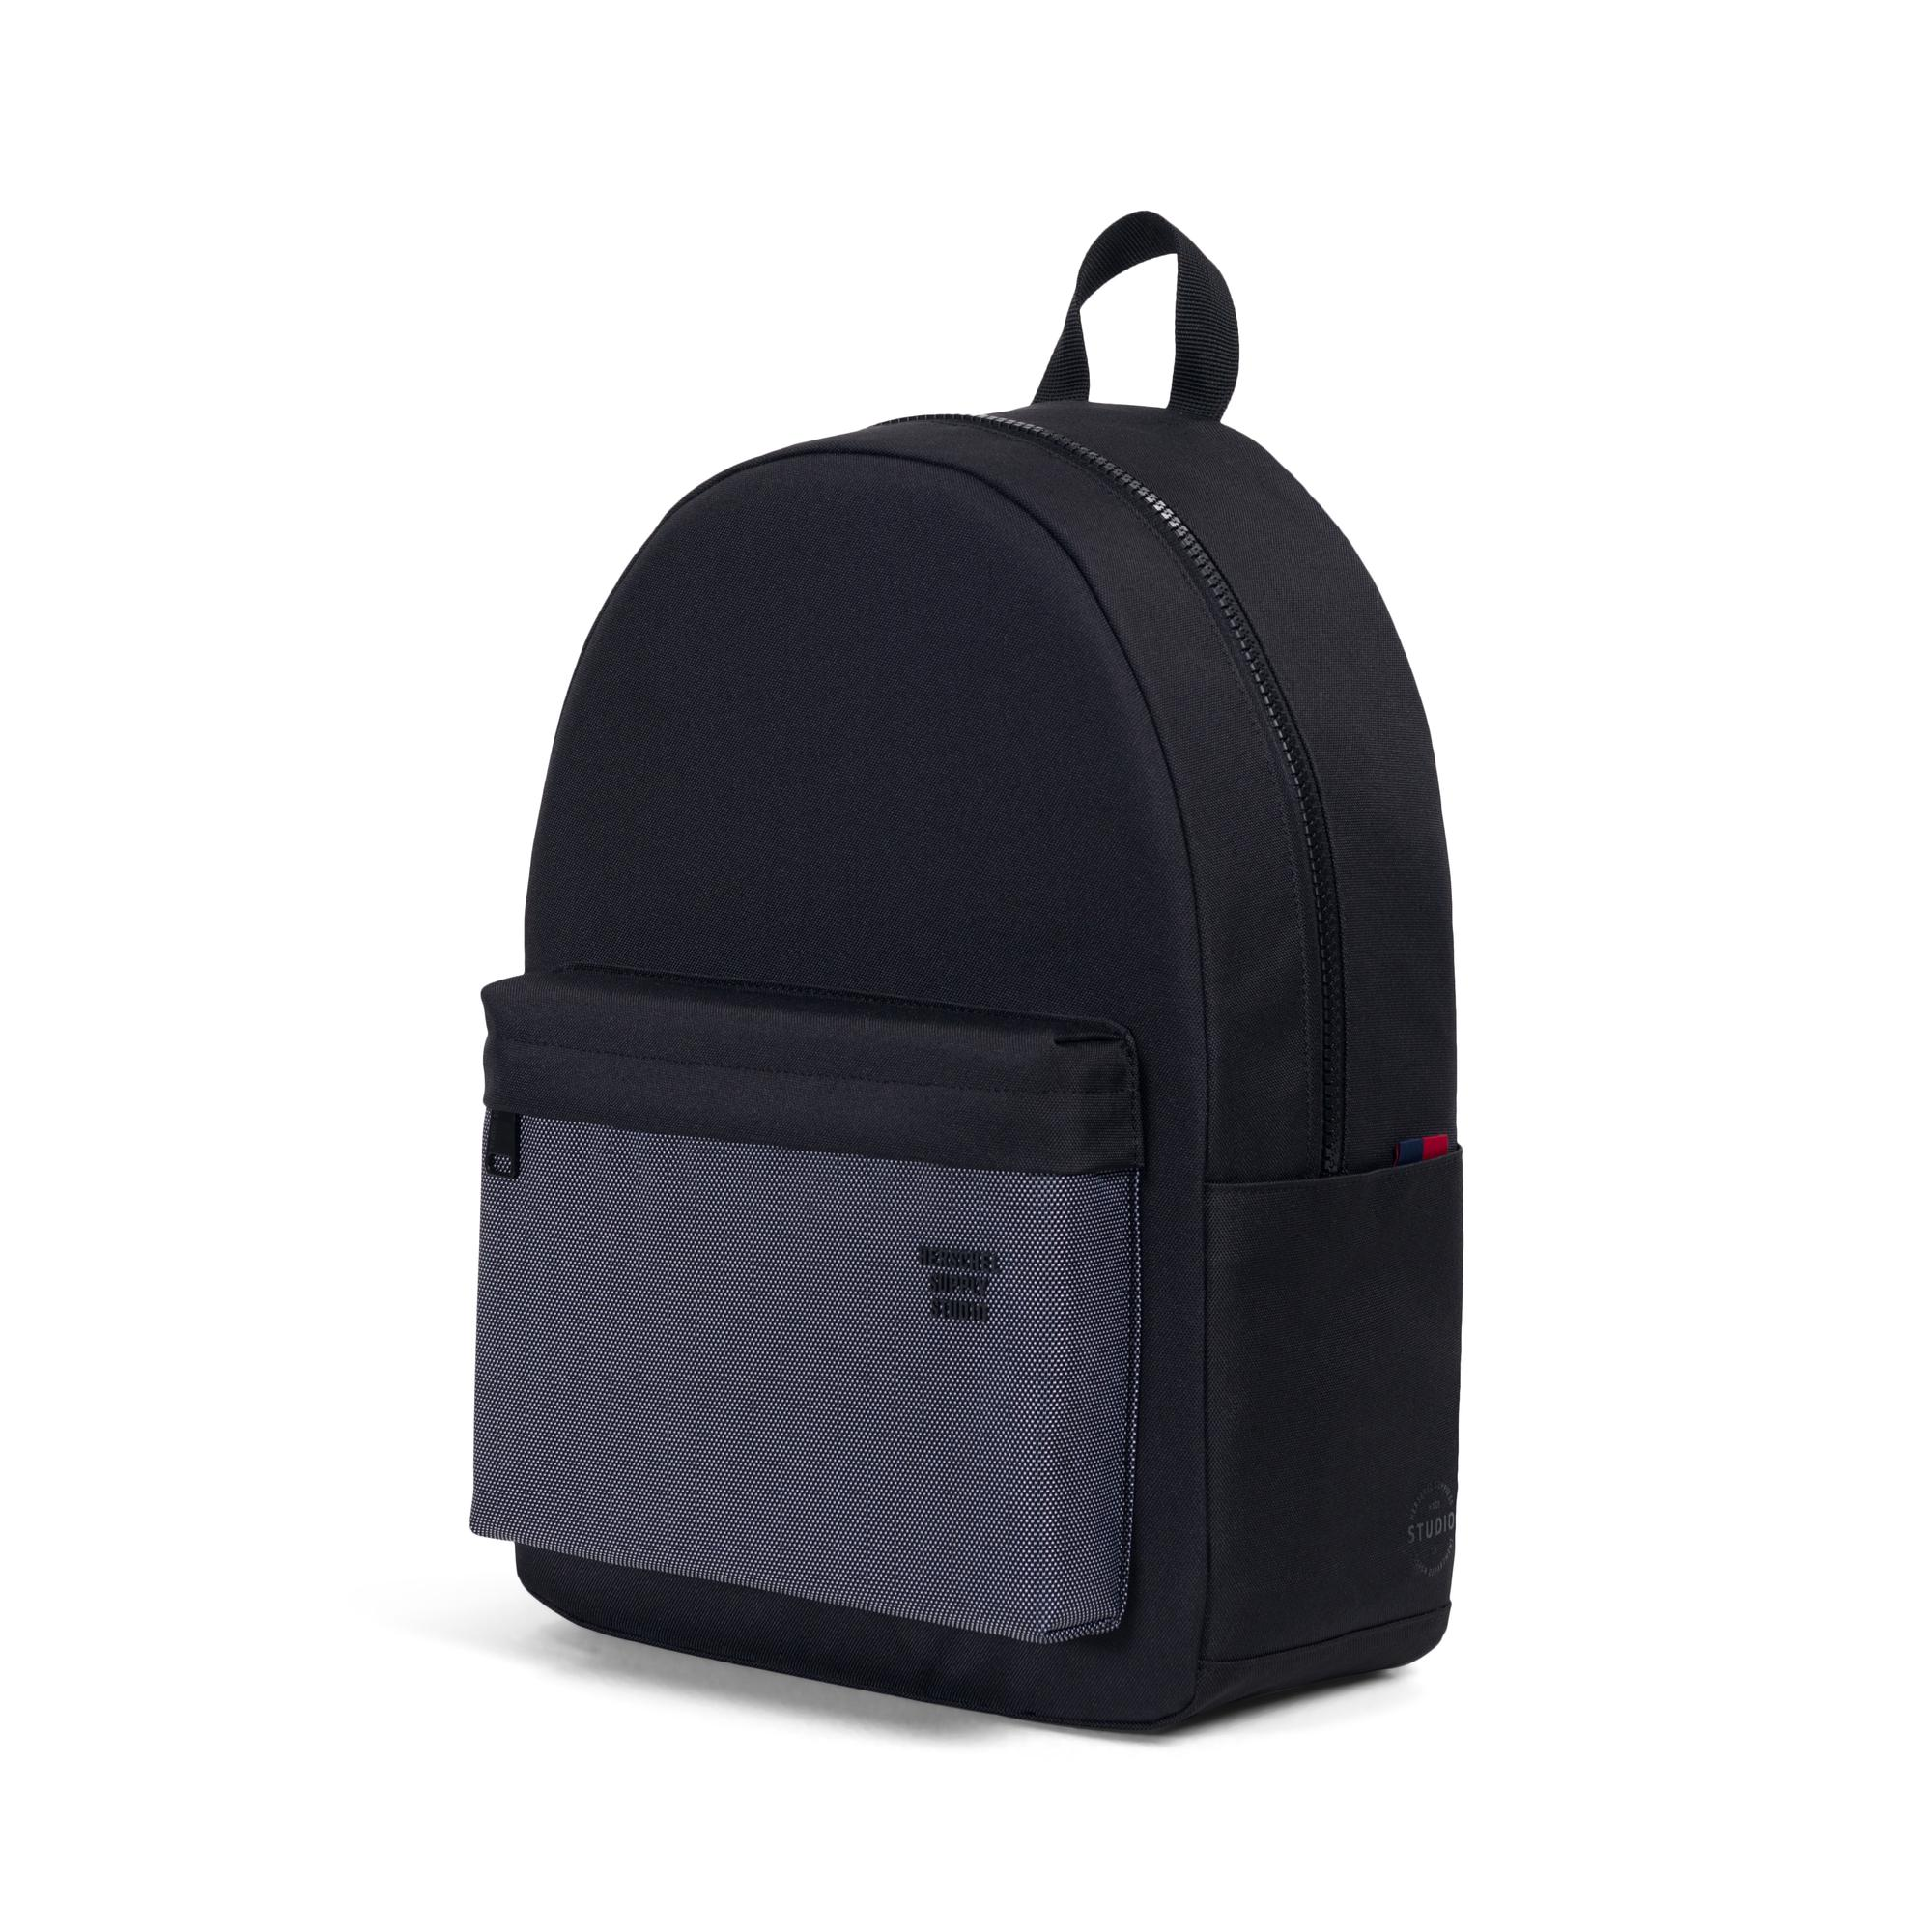 1e347176246 Winlaw Backpack XL Studio | Herschel Supply Company